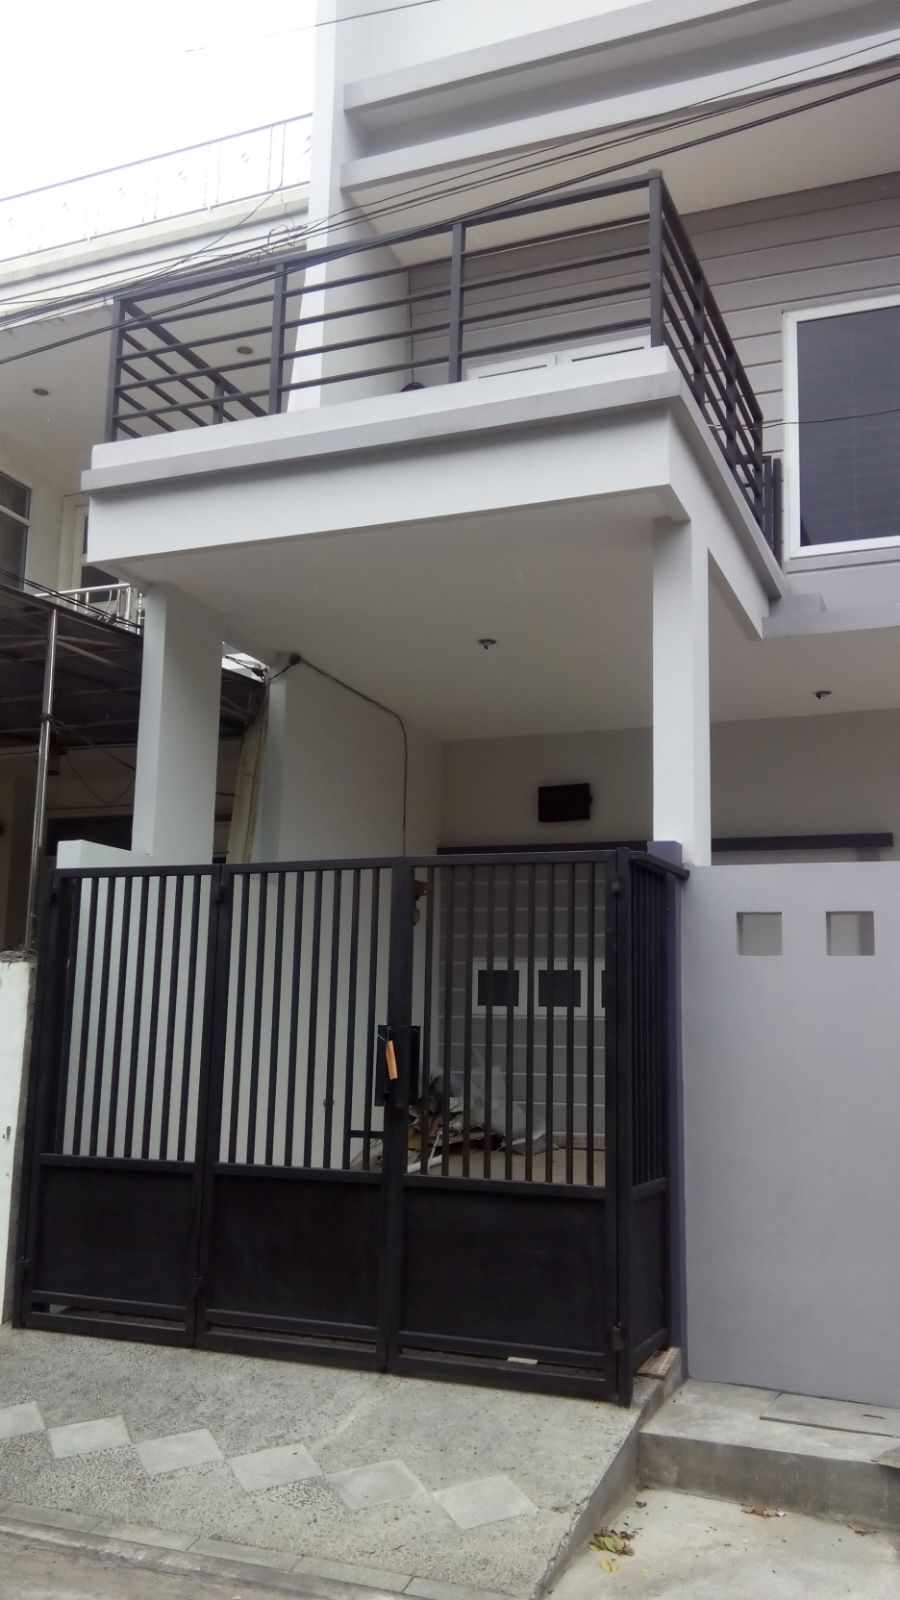 Harga Pagar Rumah : harga, pagar, rumah, Pagar, Rumah, Minimalis, Harga, Arsitekhom